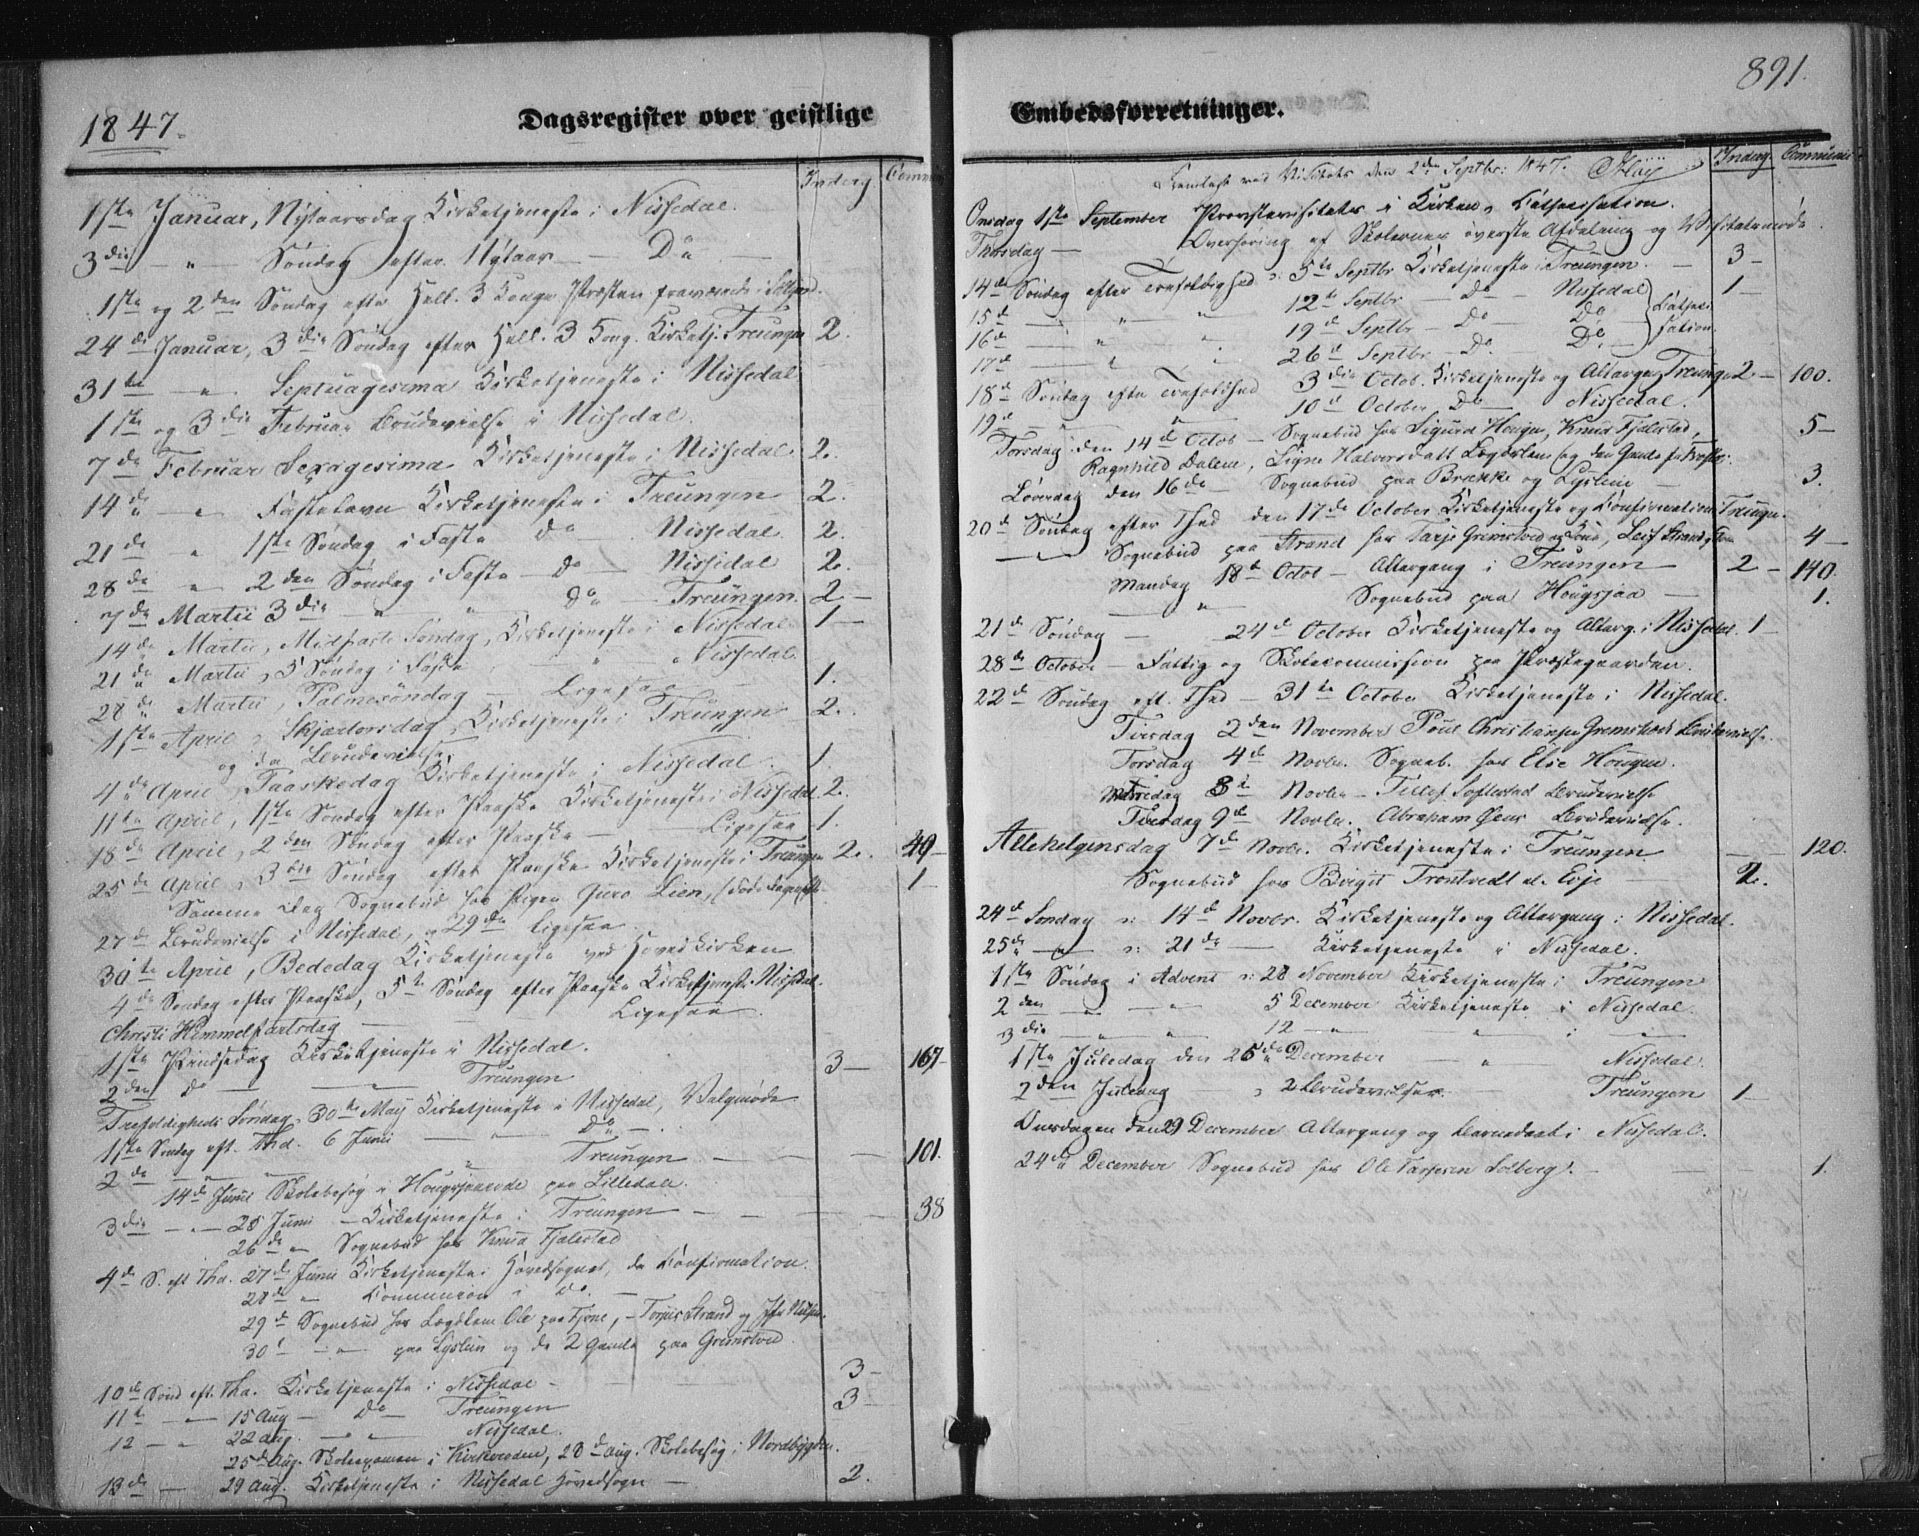 SAKO, Nissedal kirkebøker, F/Fa/L0003: Ministerialbok nr. I 3, 1846-1870, s. 890-891